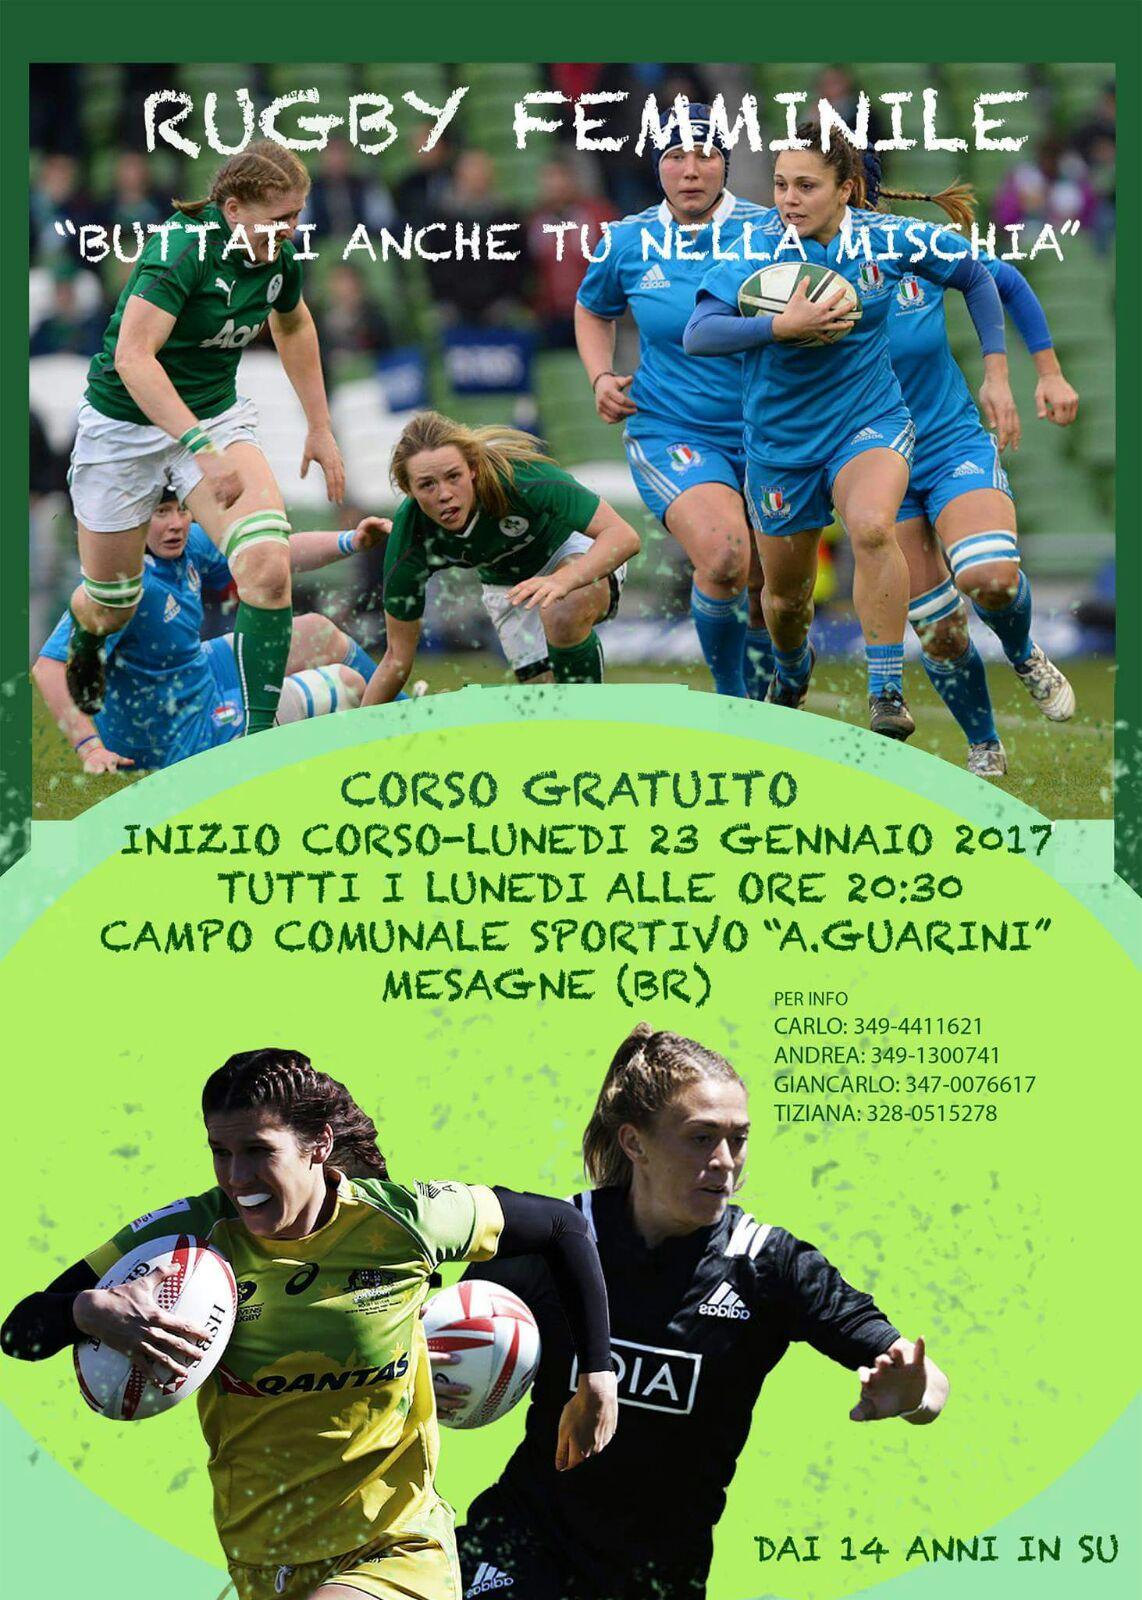 Il Rugby femminile arriva a Mesagne